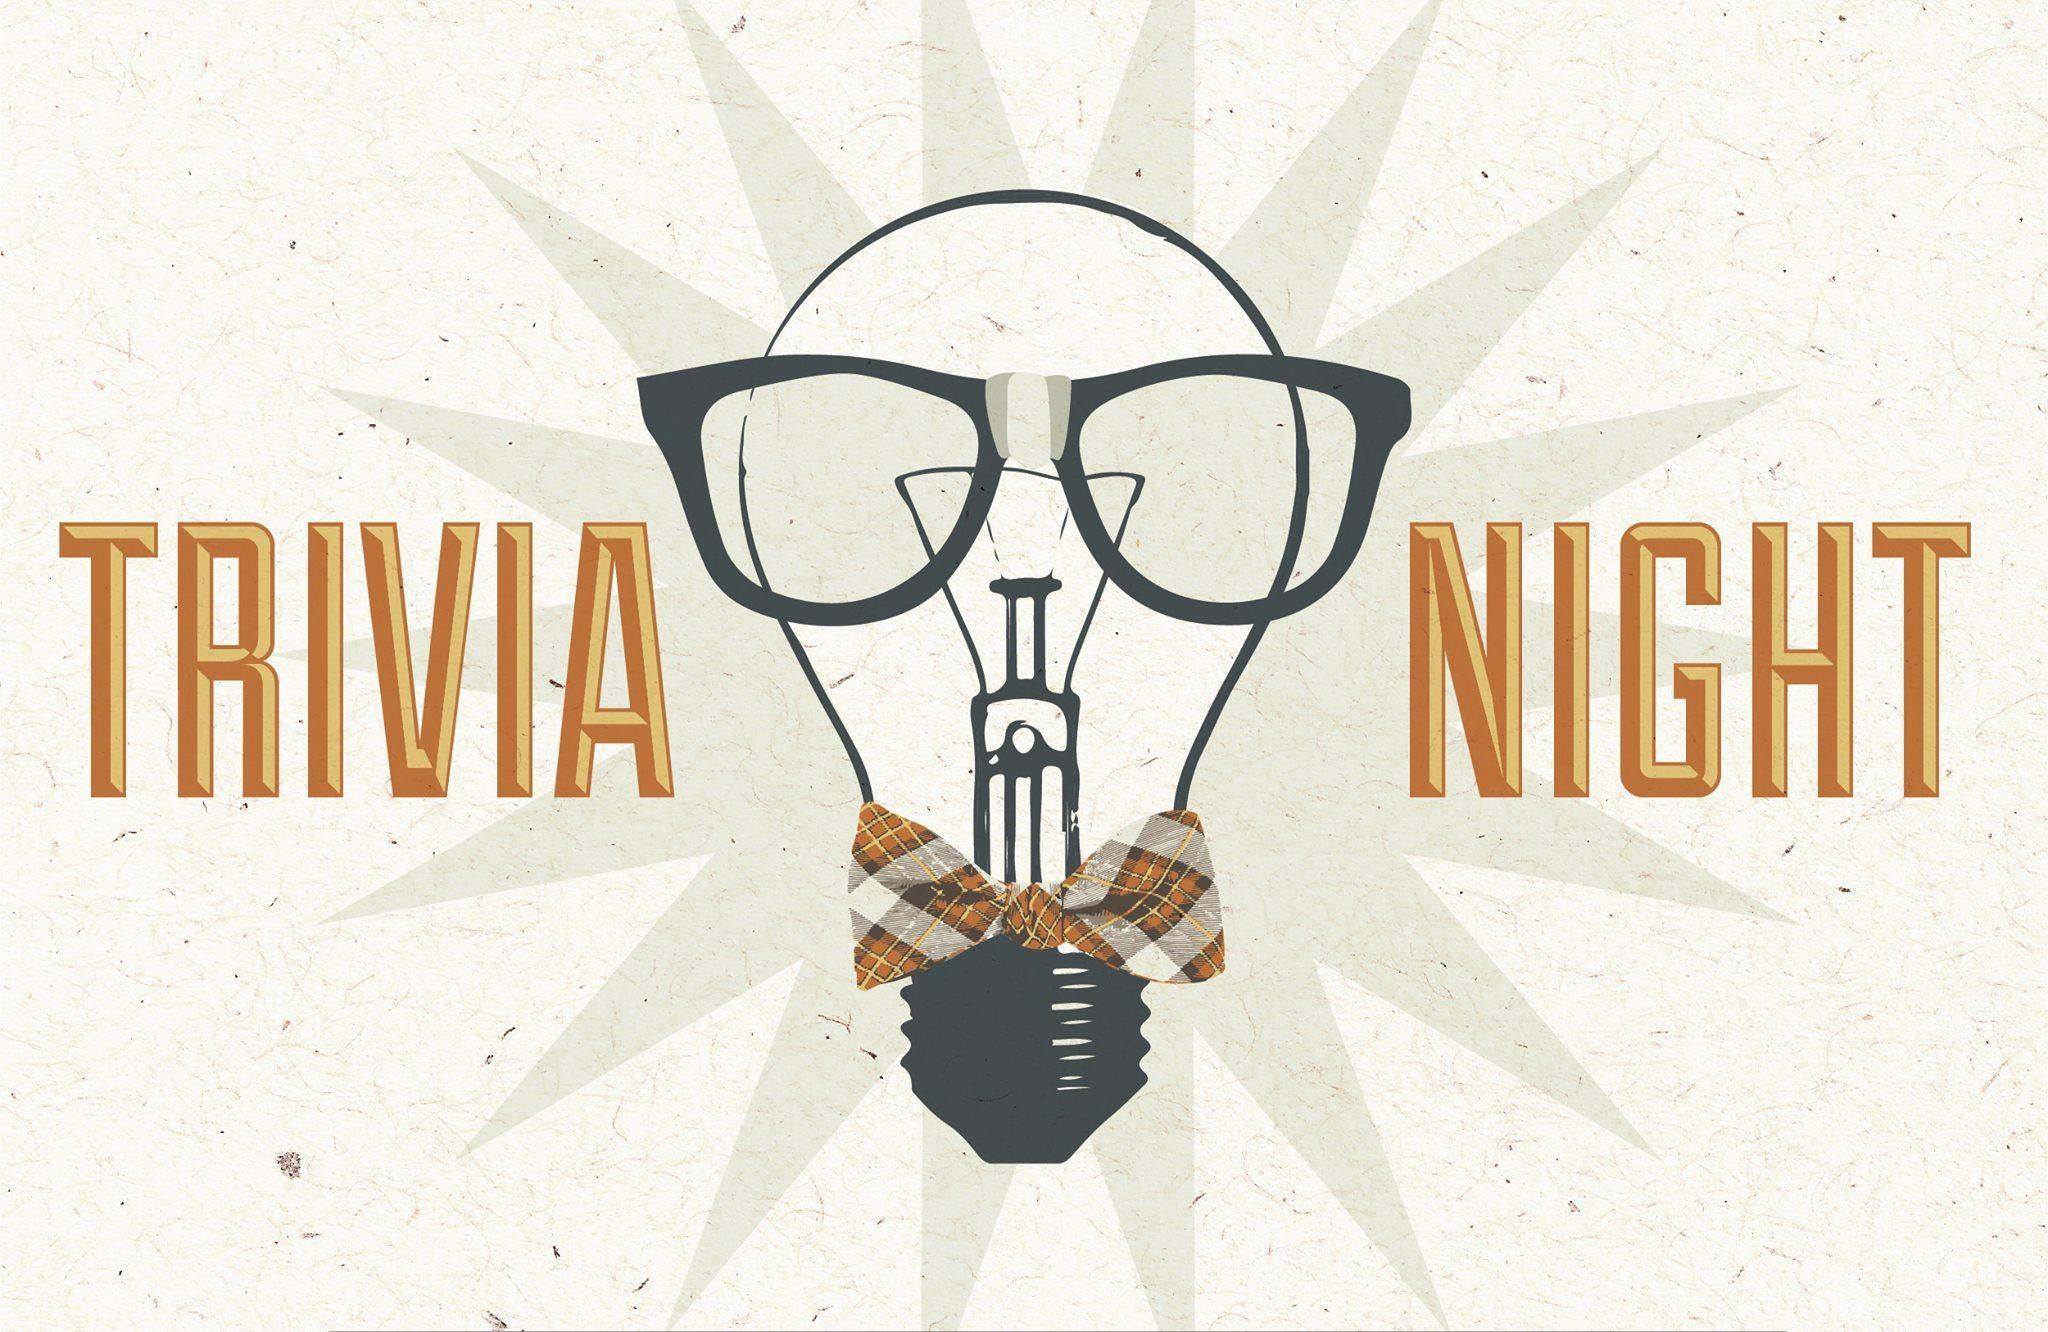 free clip art quiz night - photo #47